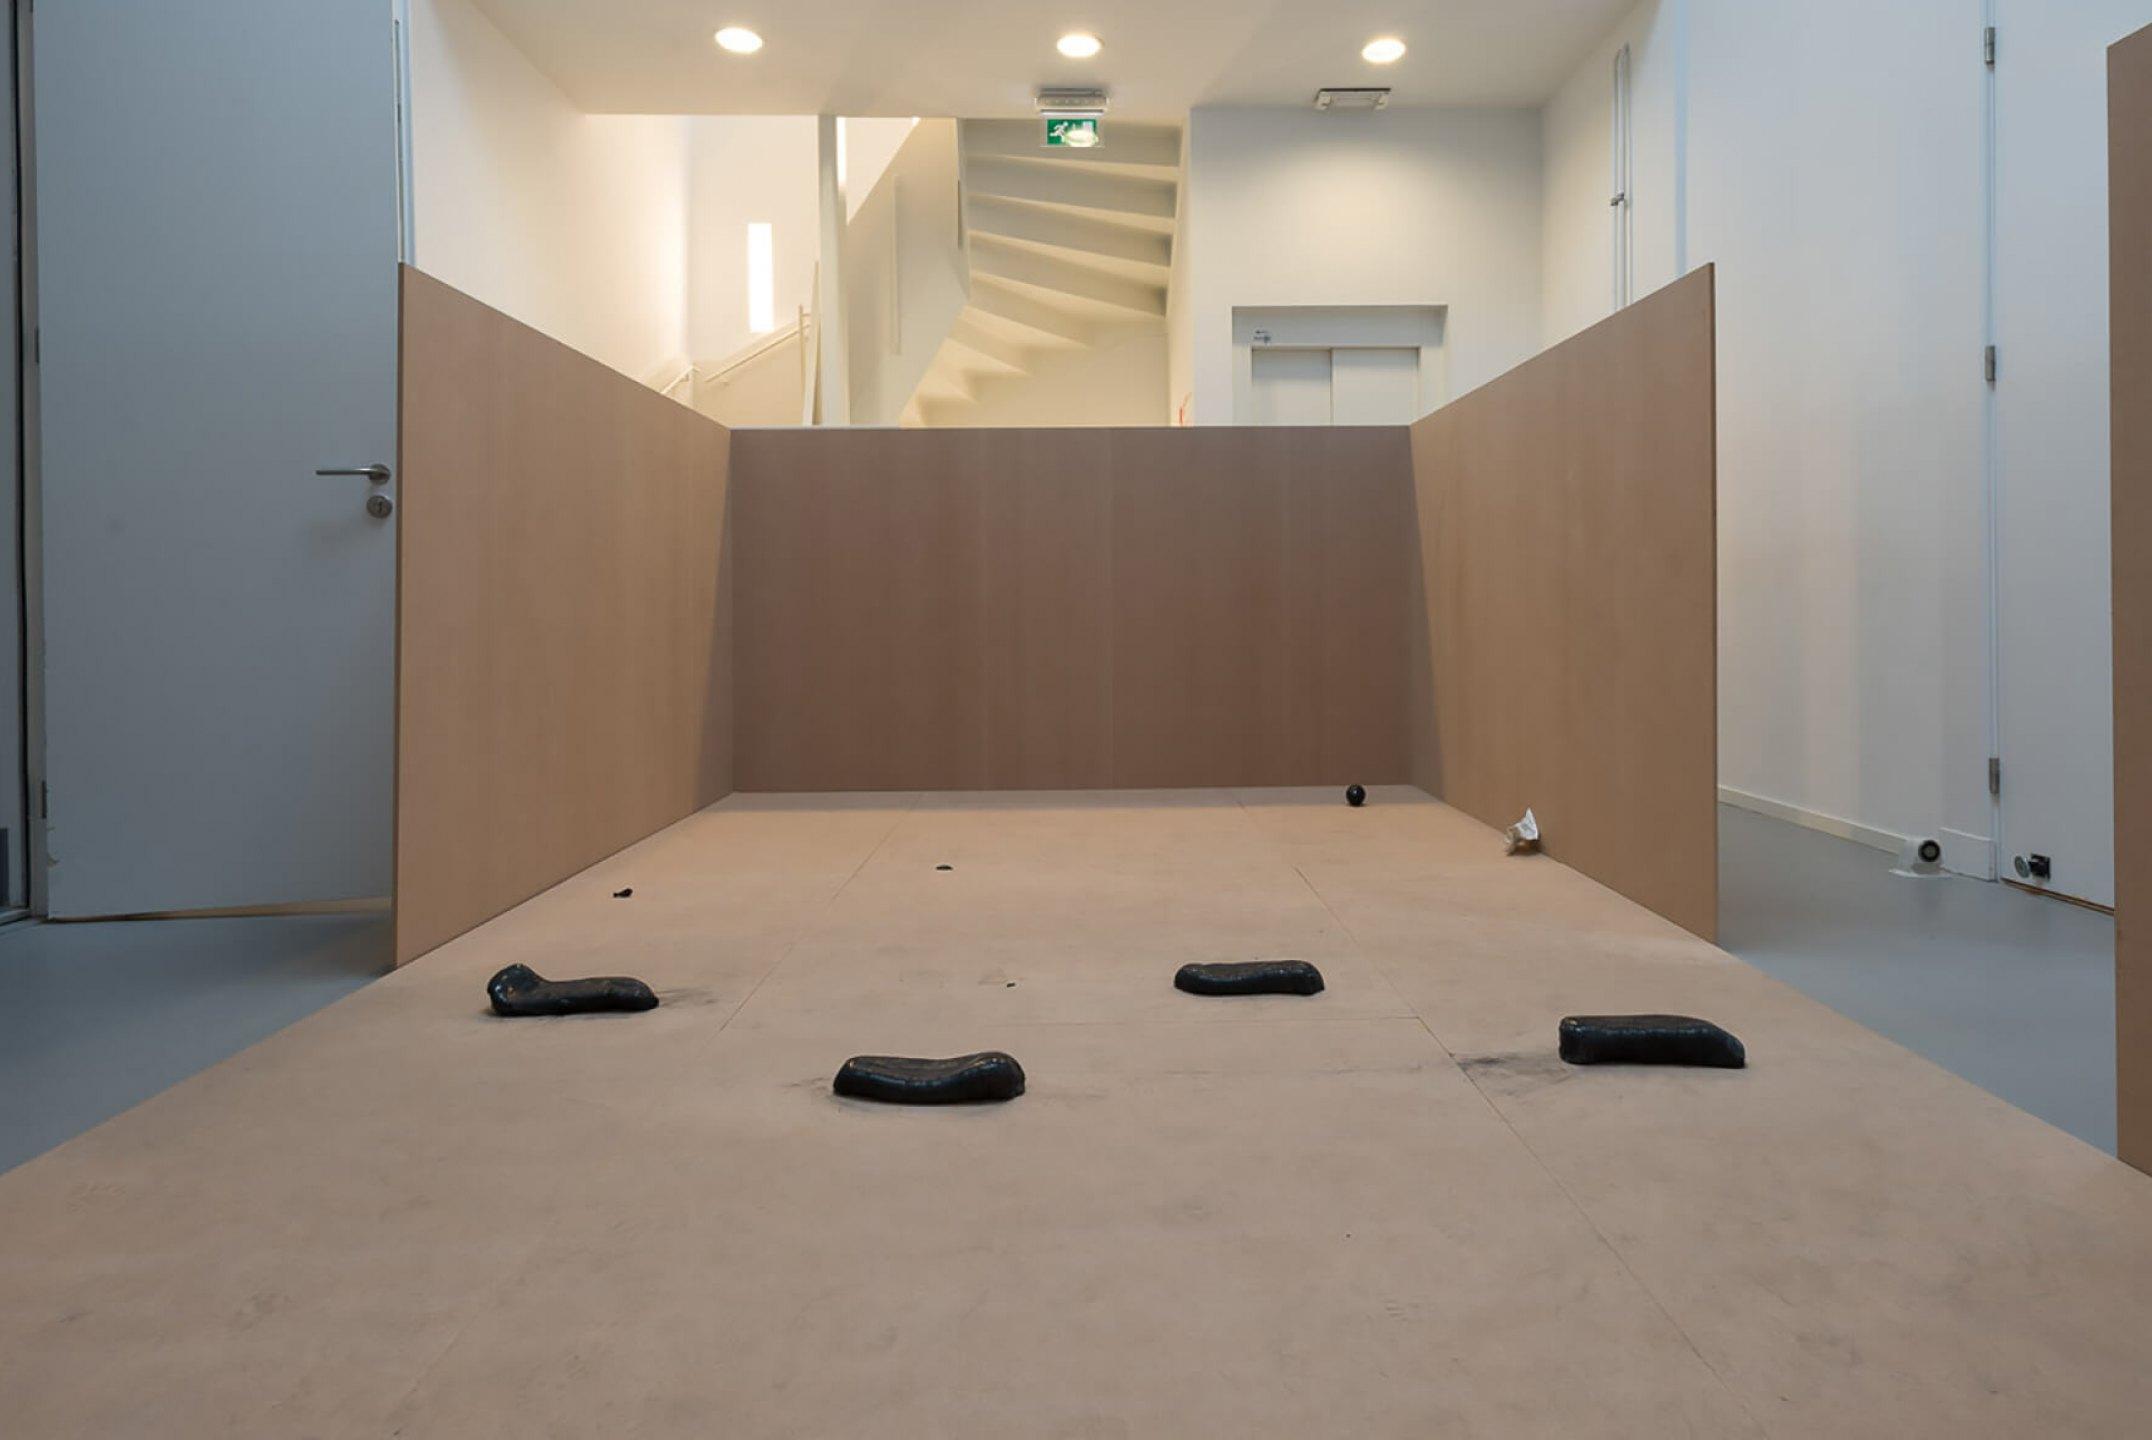 Michael Dean,<em>Qualities of Violence,</em> De Appel Arts Centre, Amsterdam, 2015 - Mendes Wood DM